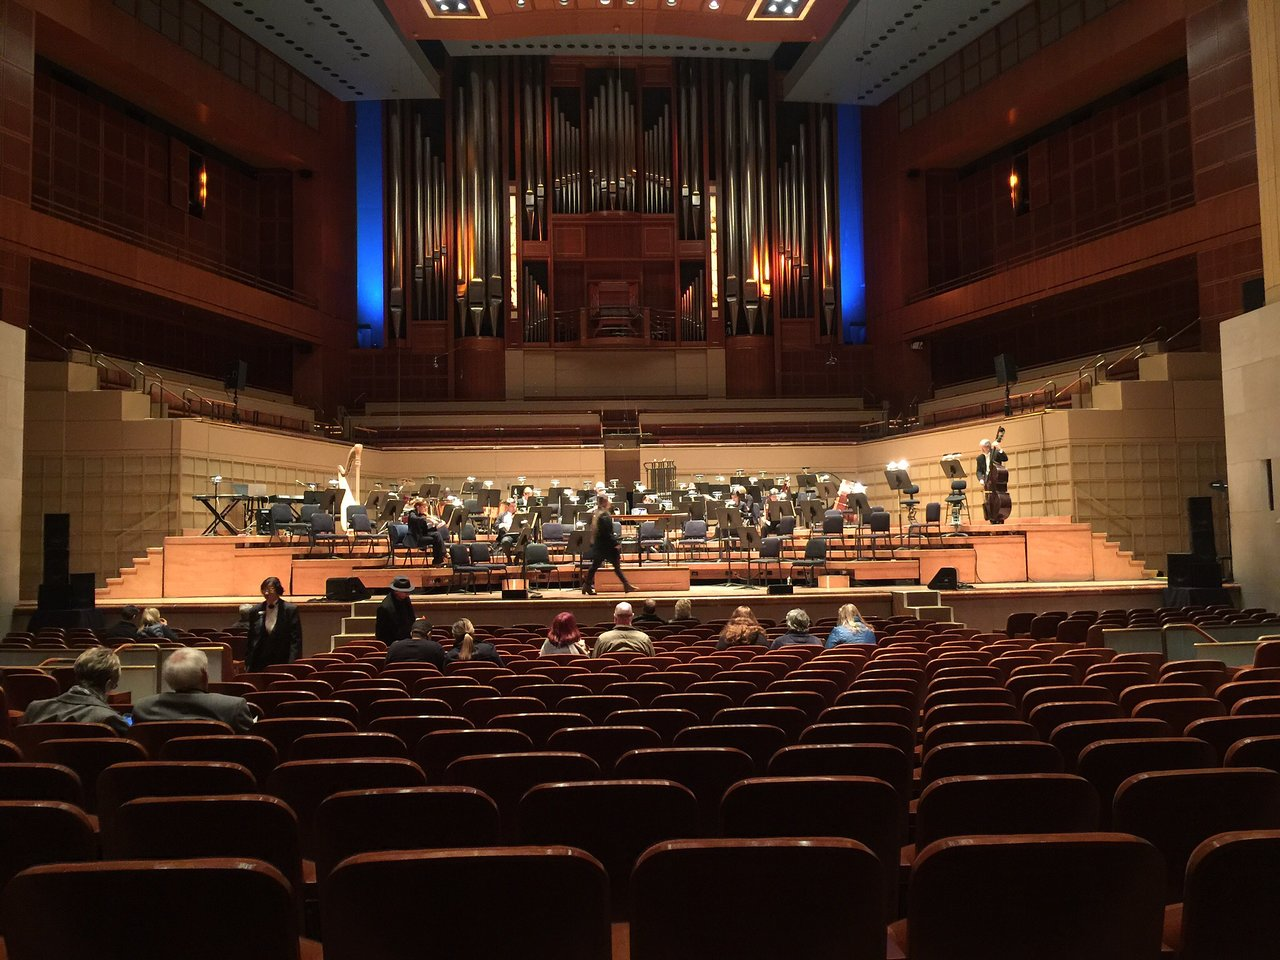 Dallas Symphony Orchestra - 2020 All